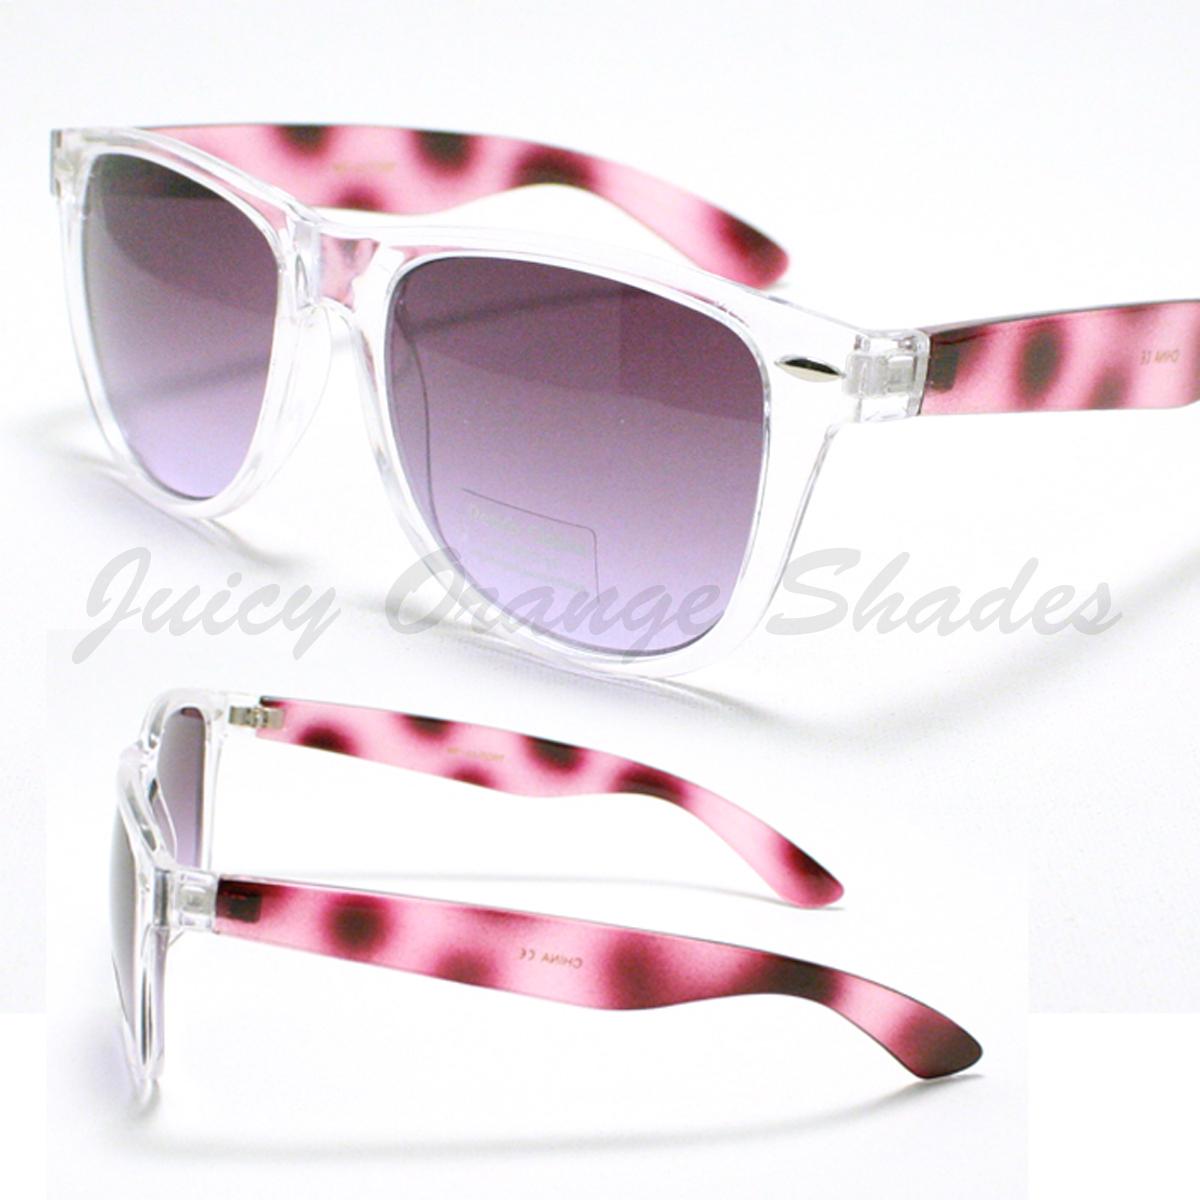 POPULAR Old School Sunglasses 2 Tone CLEAR TORT Colors 80's RETRO FUN Shades NEW